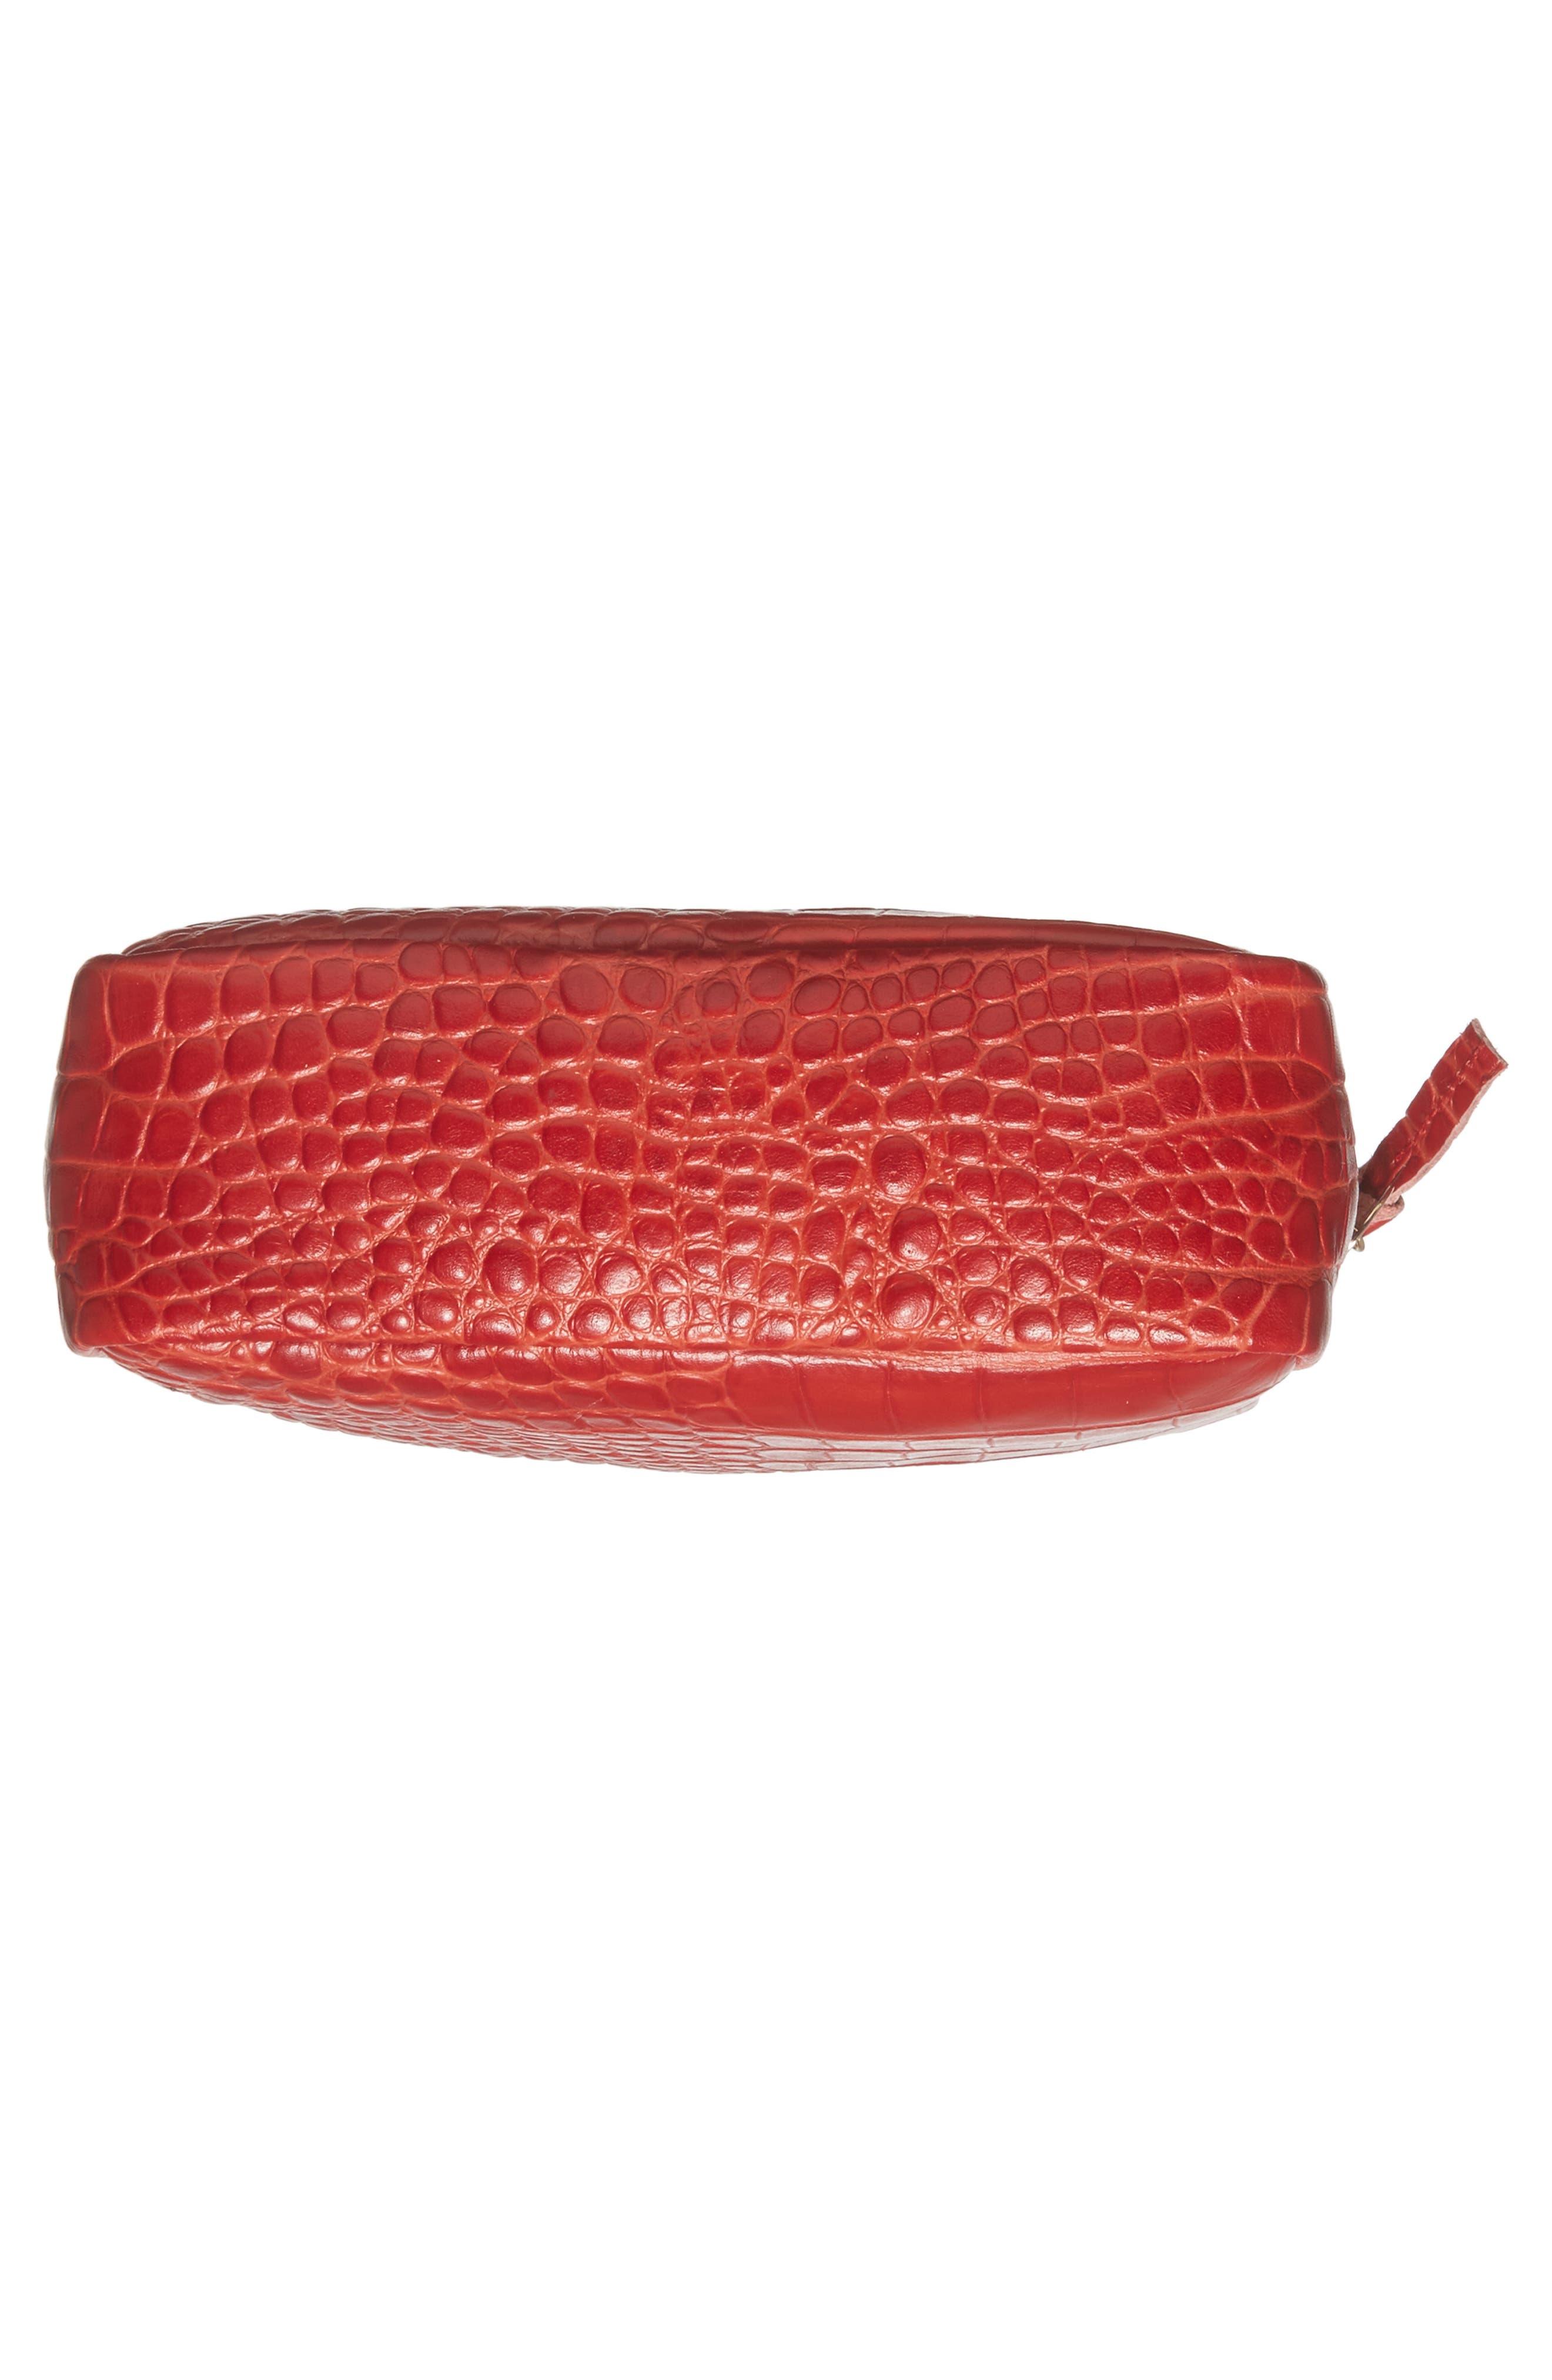 Midi Sac Supreme Croc Embossed Leather Crossbody Bag,                             Alternate thumbnail 6, color,                             Red Croco